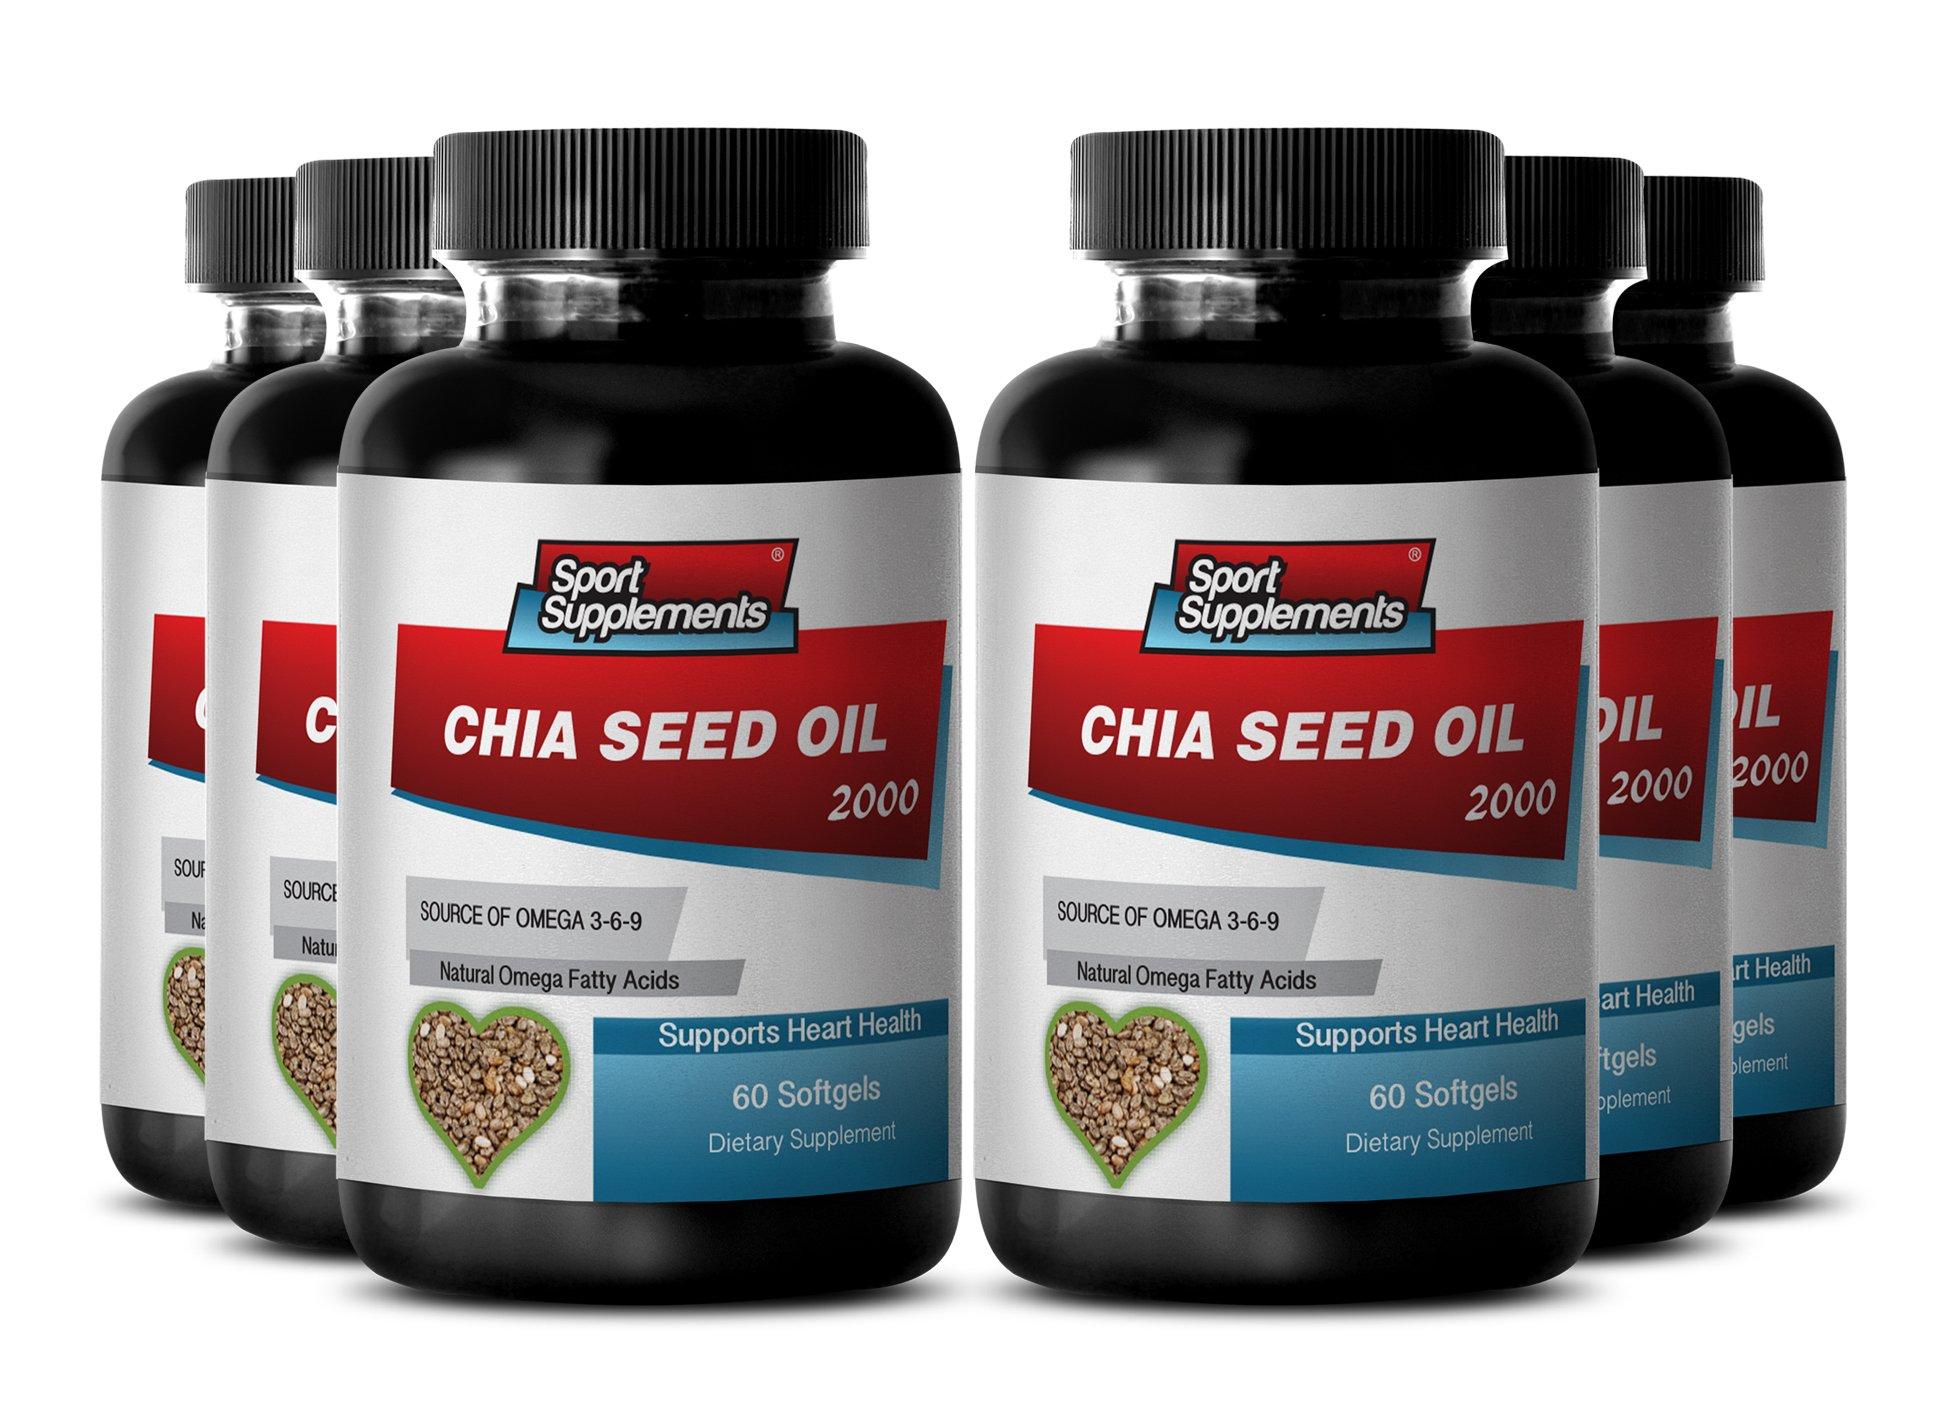 New Chia Seed Oil 2000mg (6 Bottles, 360 Softgels)